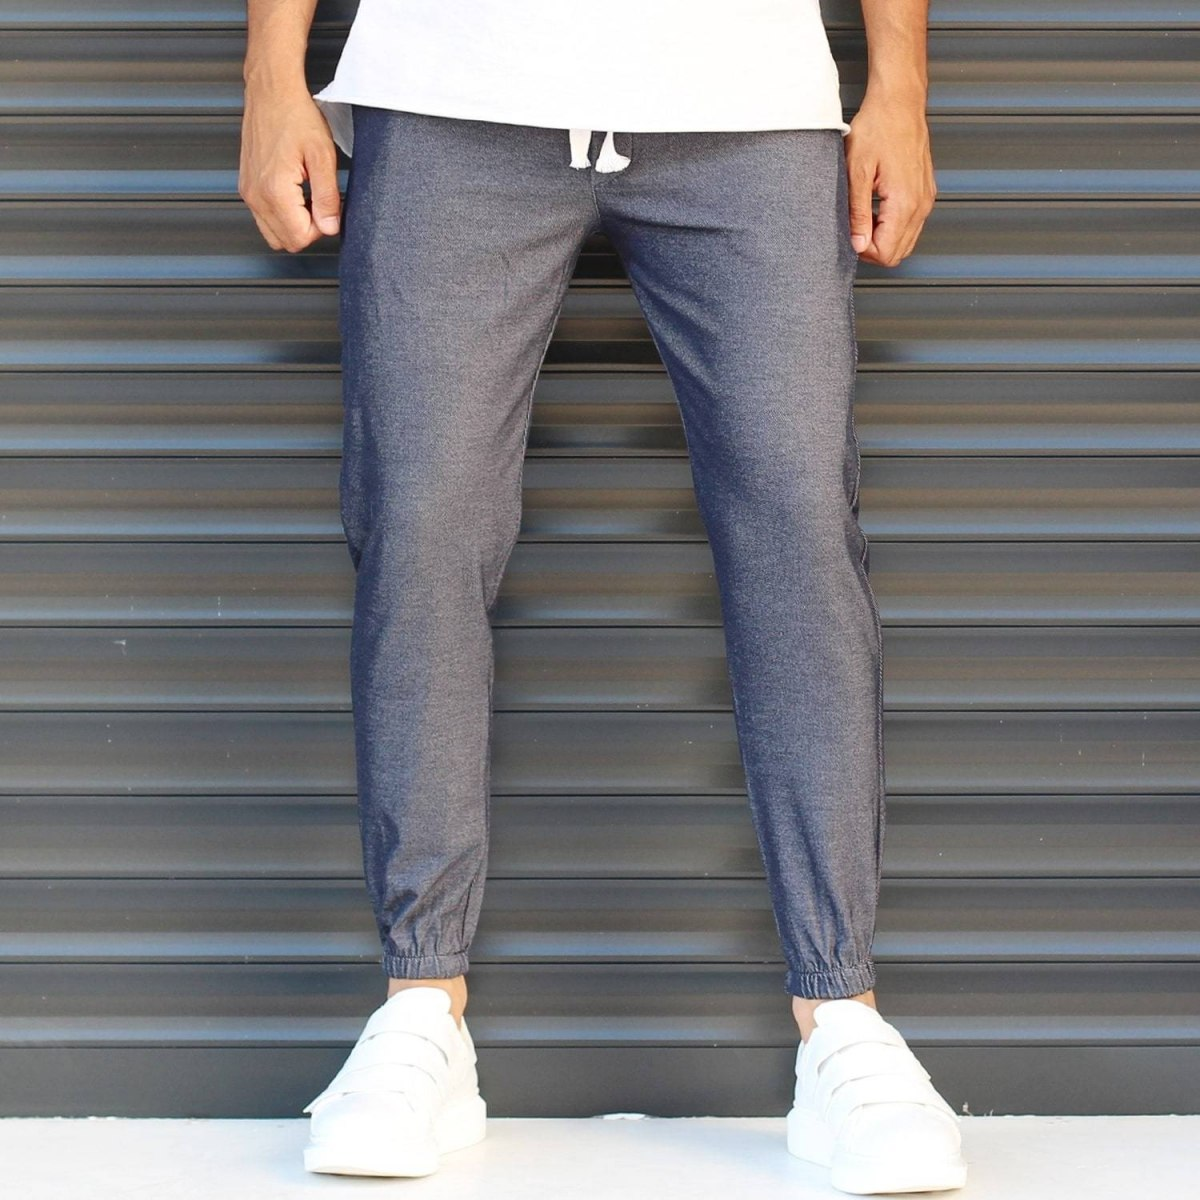 Men's Elasticated Basic Sport Pants Dark Gray Mv Premium Brand - 2